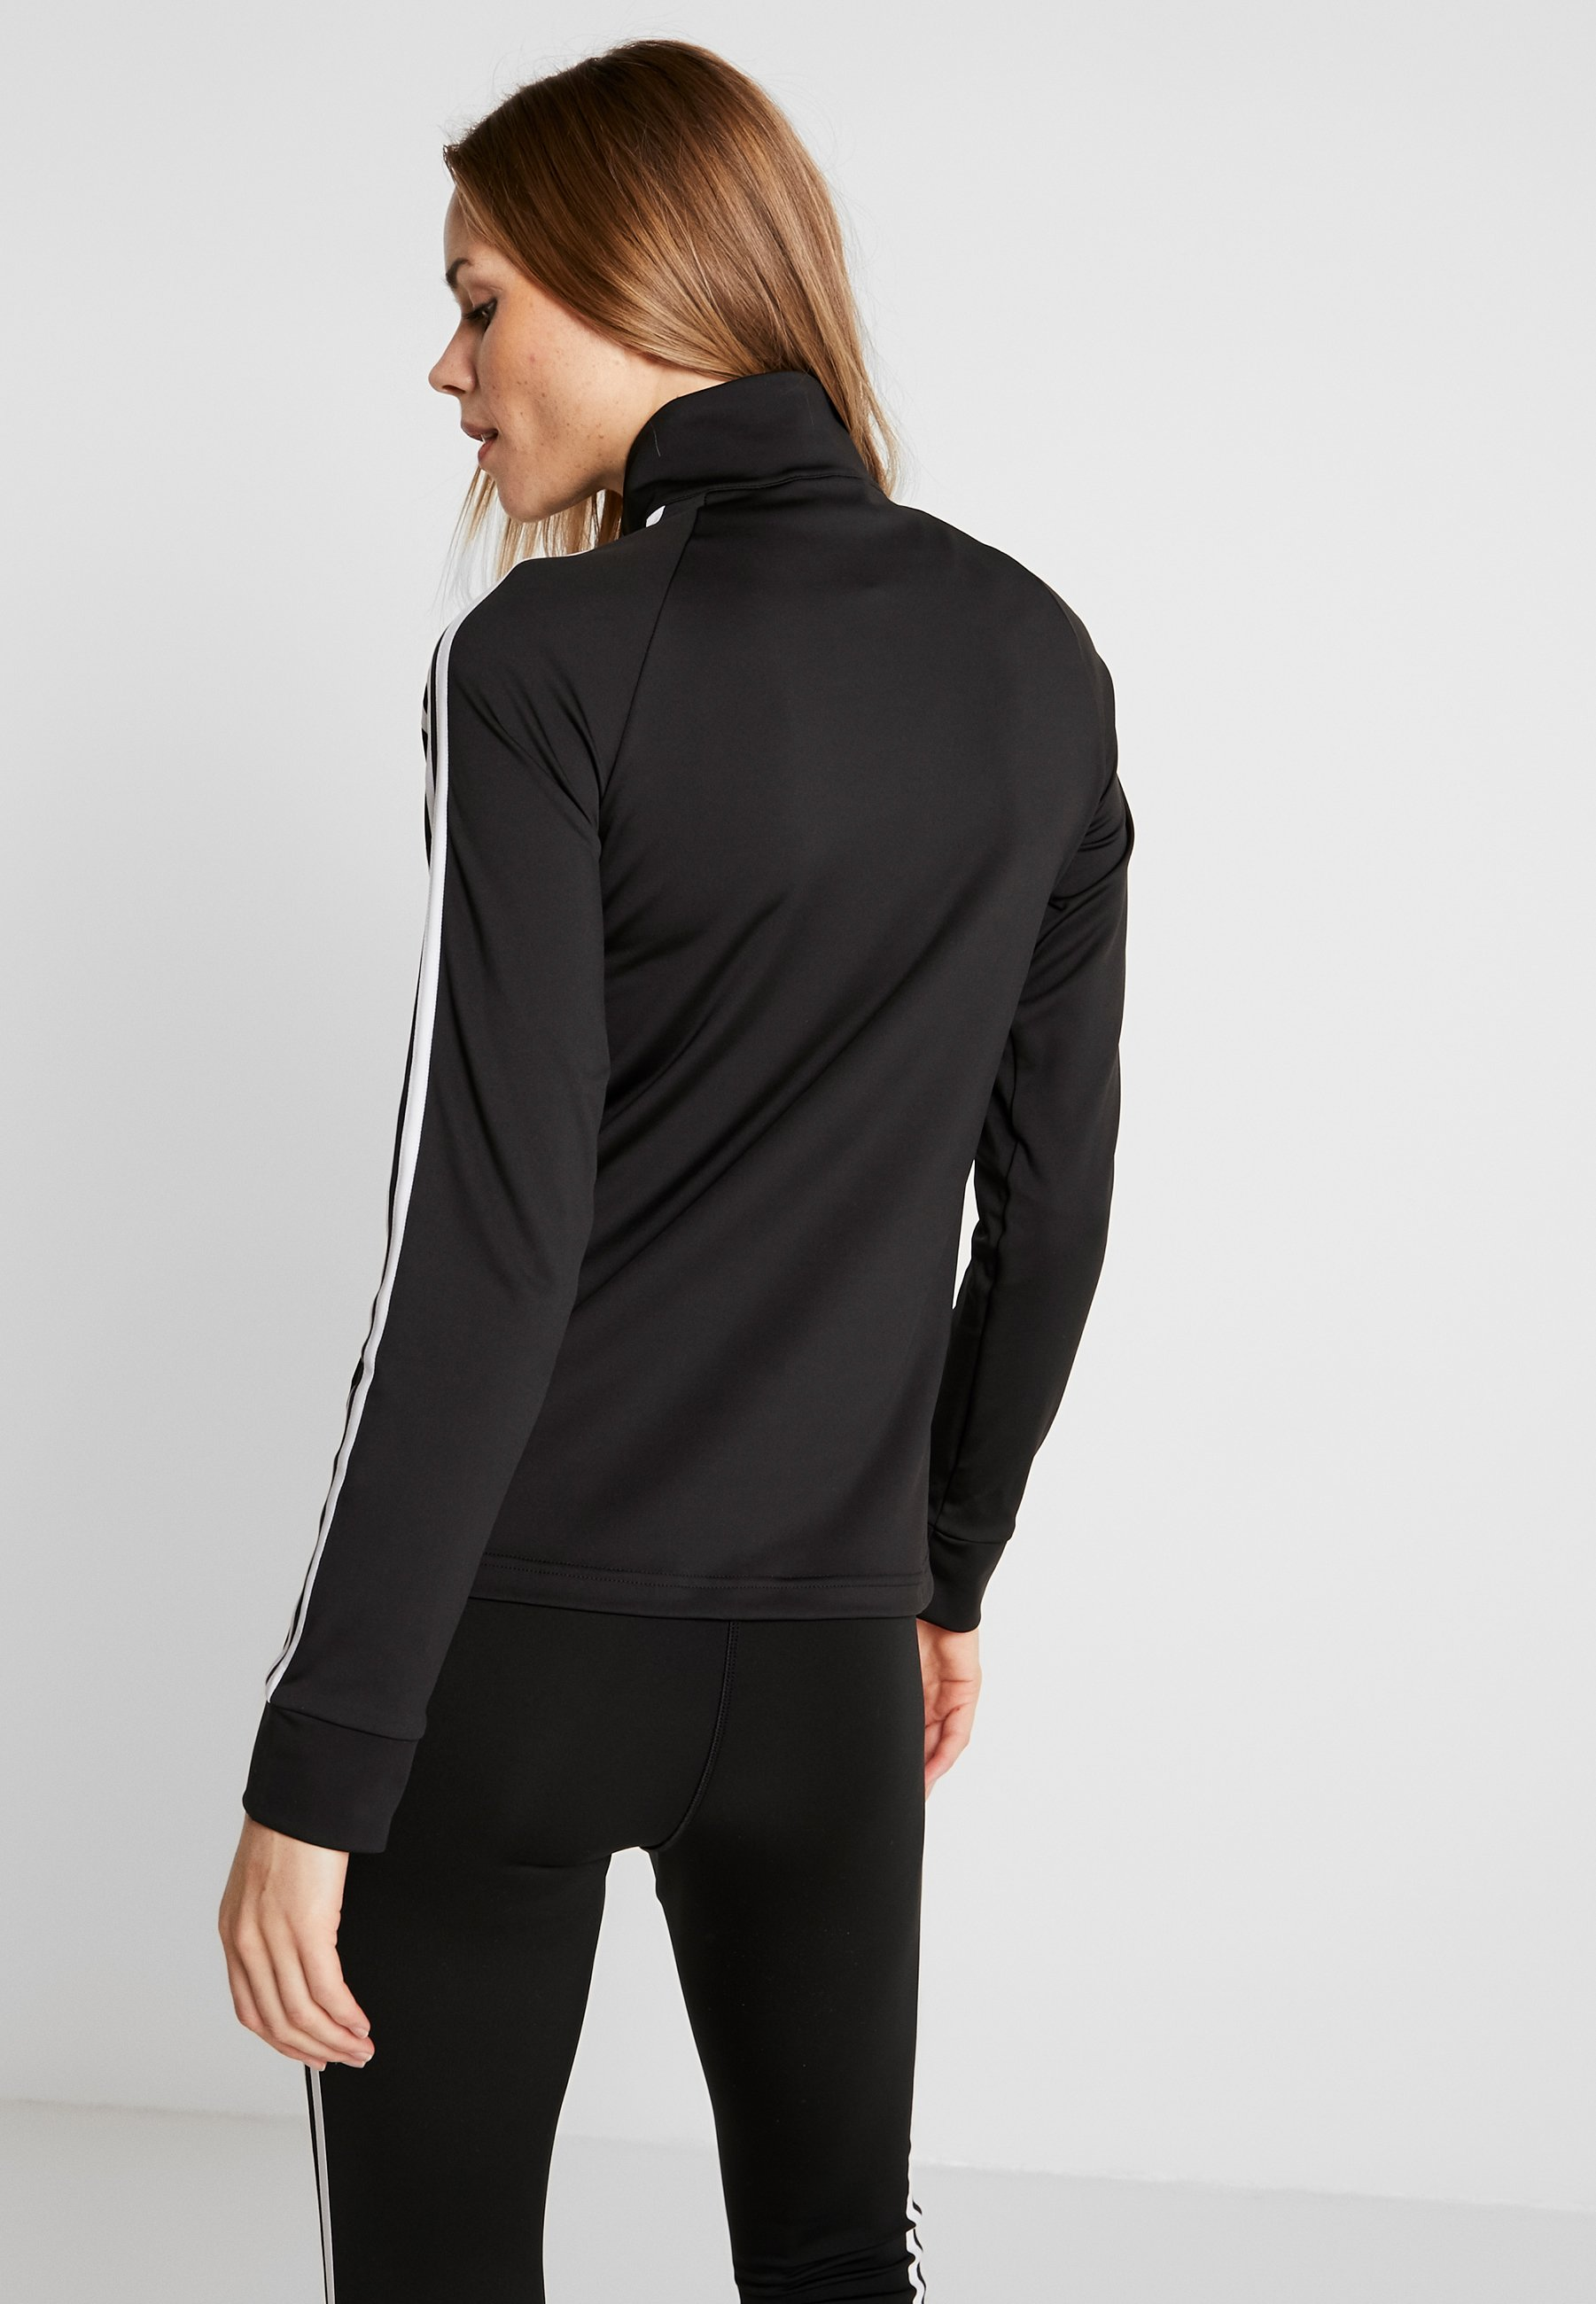 Visit New Women's Clothing adidas Performance 3STRIPES DESIGNED2MOVE SPORT TRACK TOP Training jacket black/white Po67YuvG3